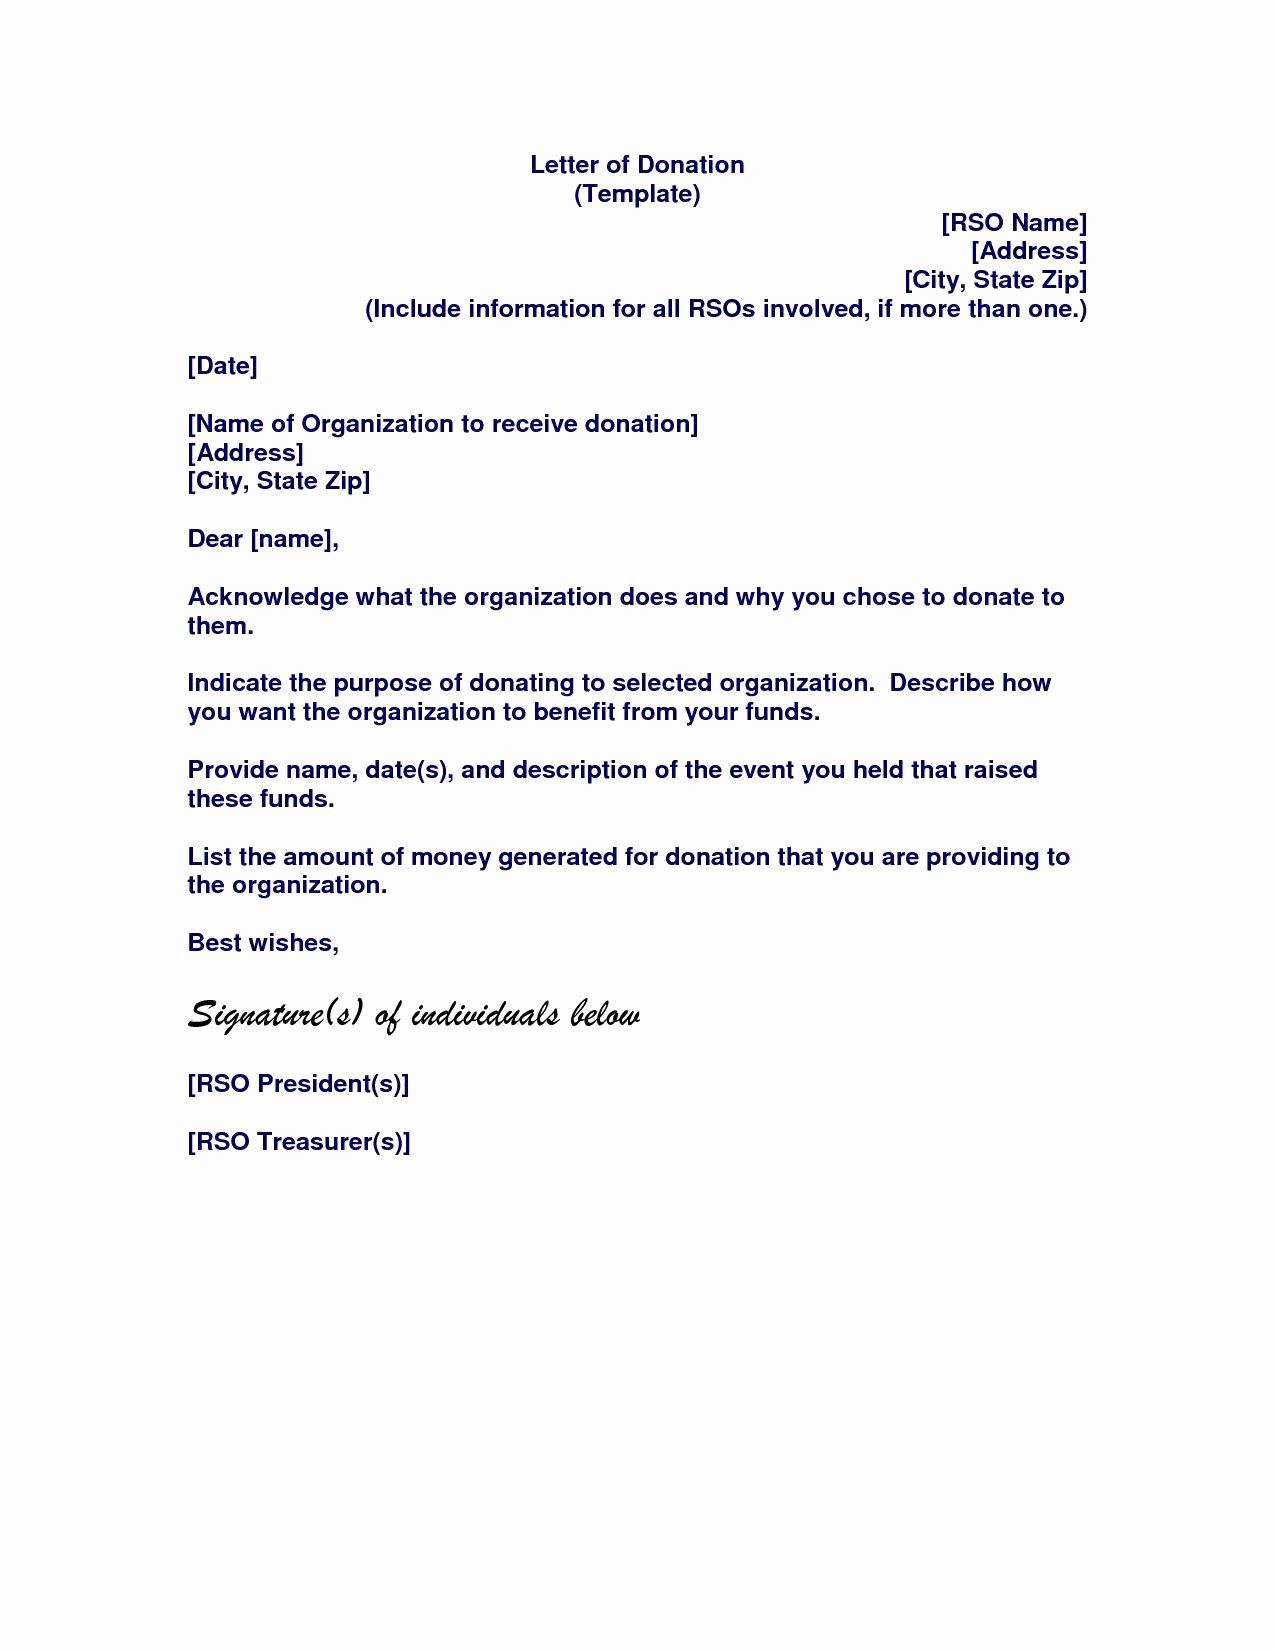 Memorial Donation Letter Template Beautiful Programming Genie Garage Door Opener to Car 332ndf